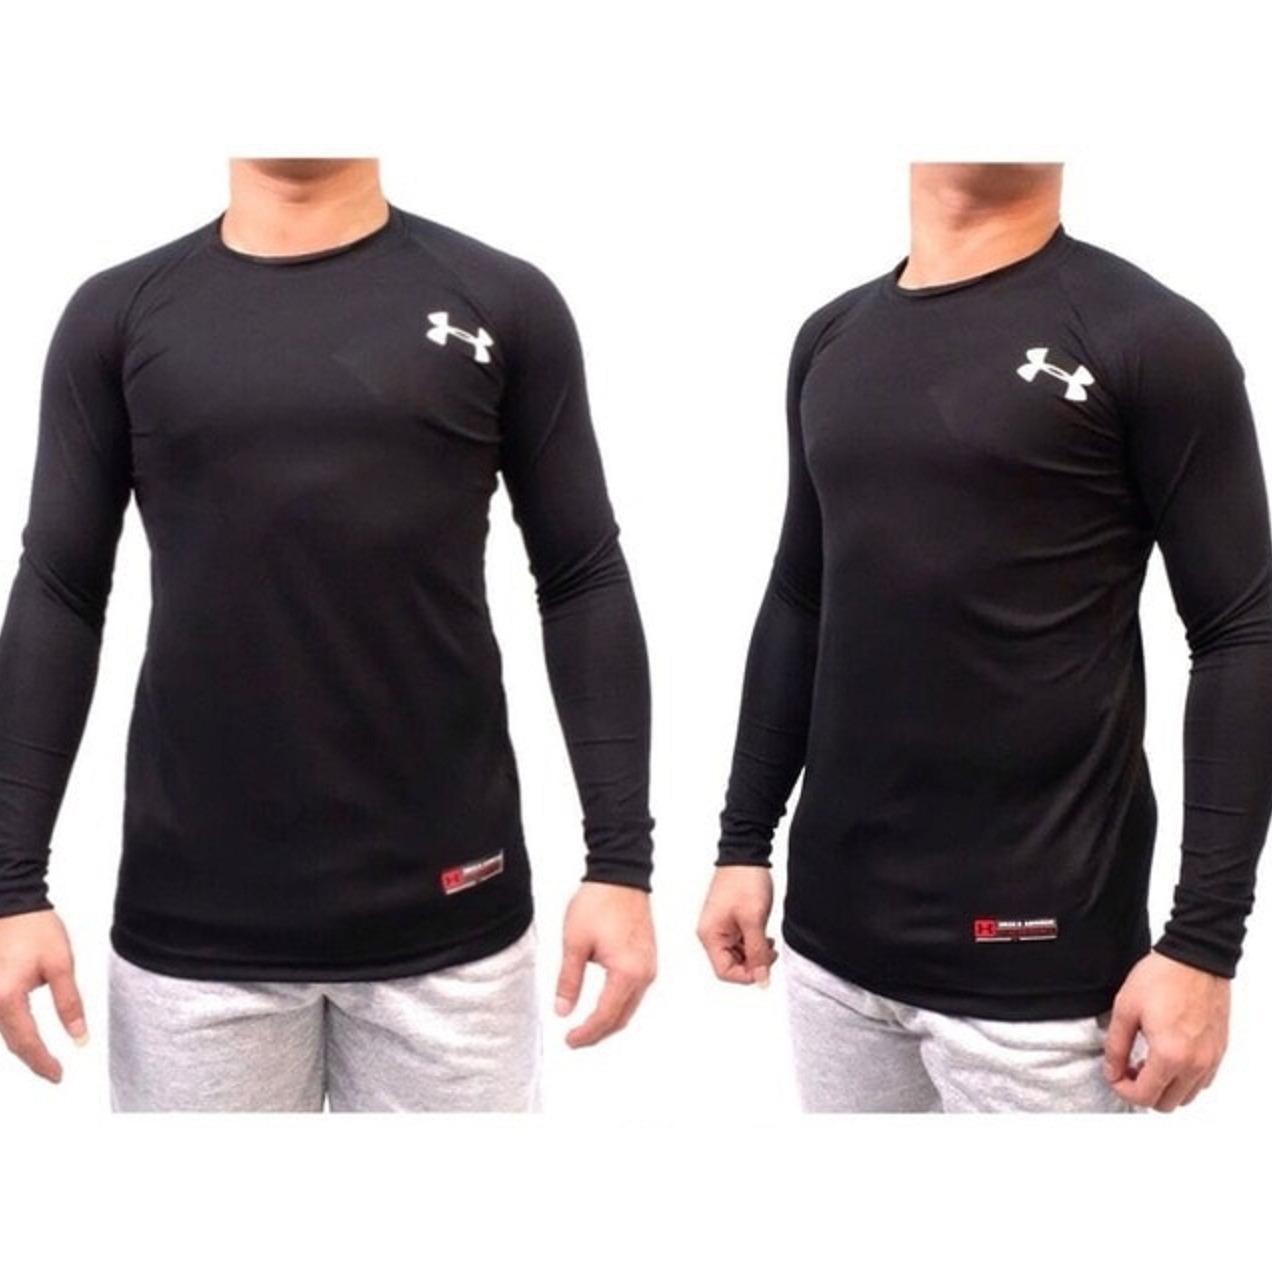 Cek Harga Baru Kaos Tshirt Manset Baselayer Under Armour Run Celana Original